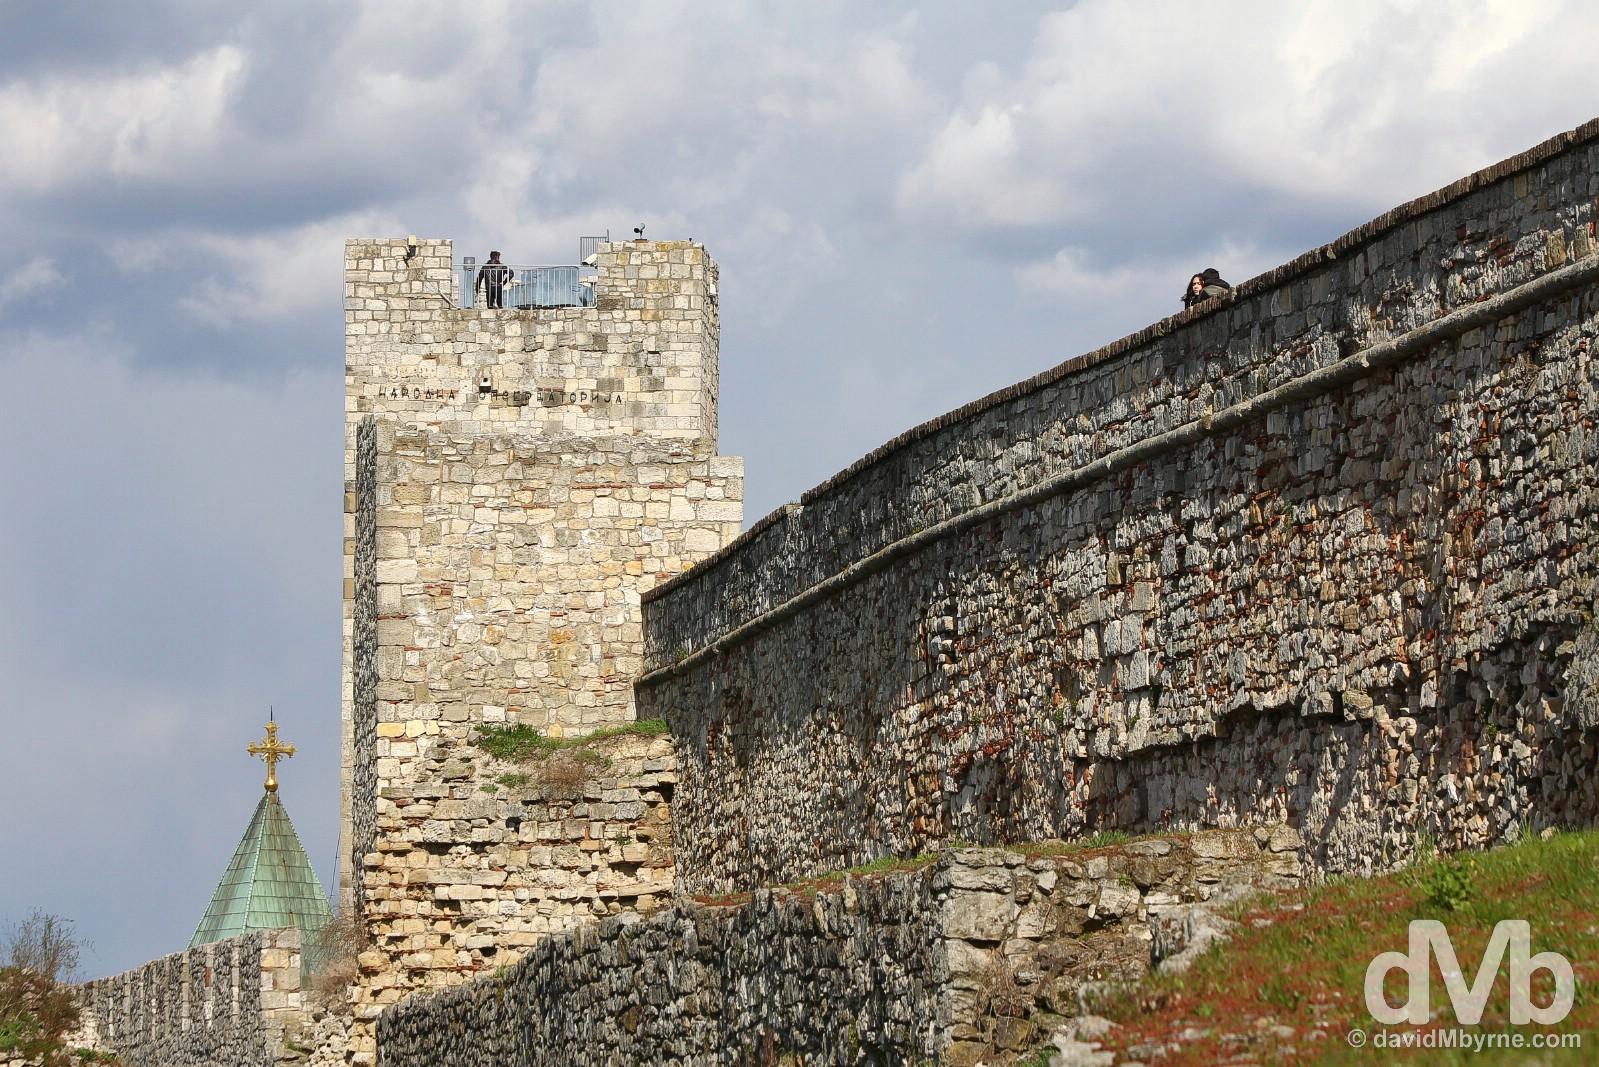 Atop the walls of the Kalemegdam Citadel overlooking the Danube River in Belgrade, Serbia. April 3, 2015.